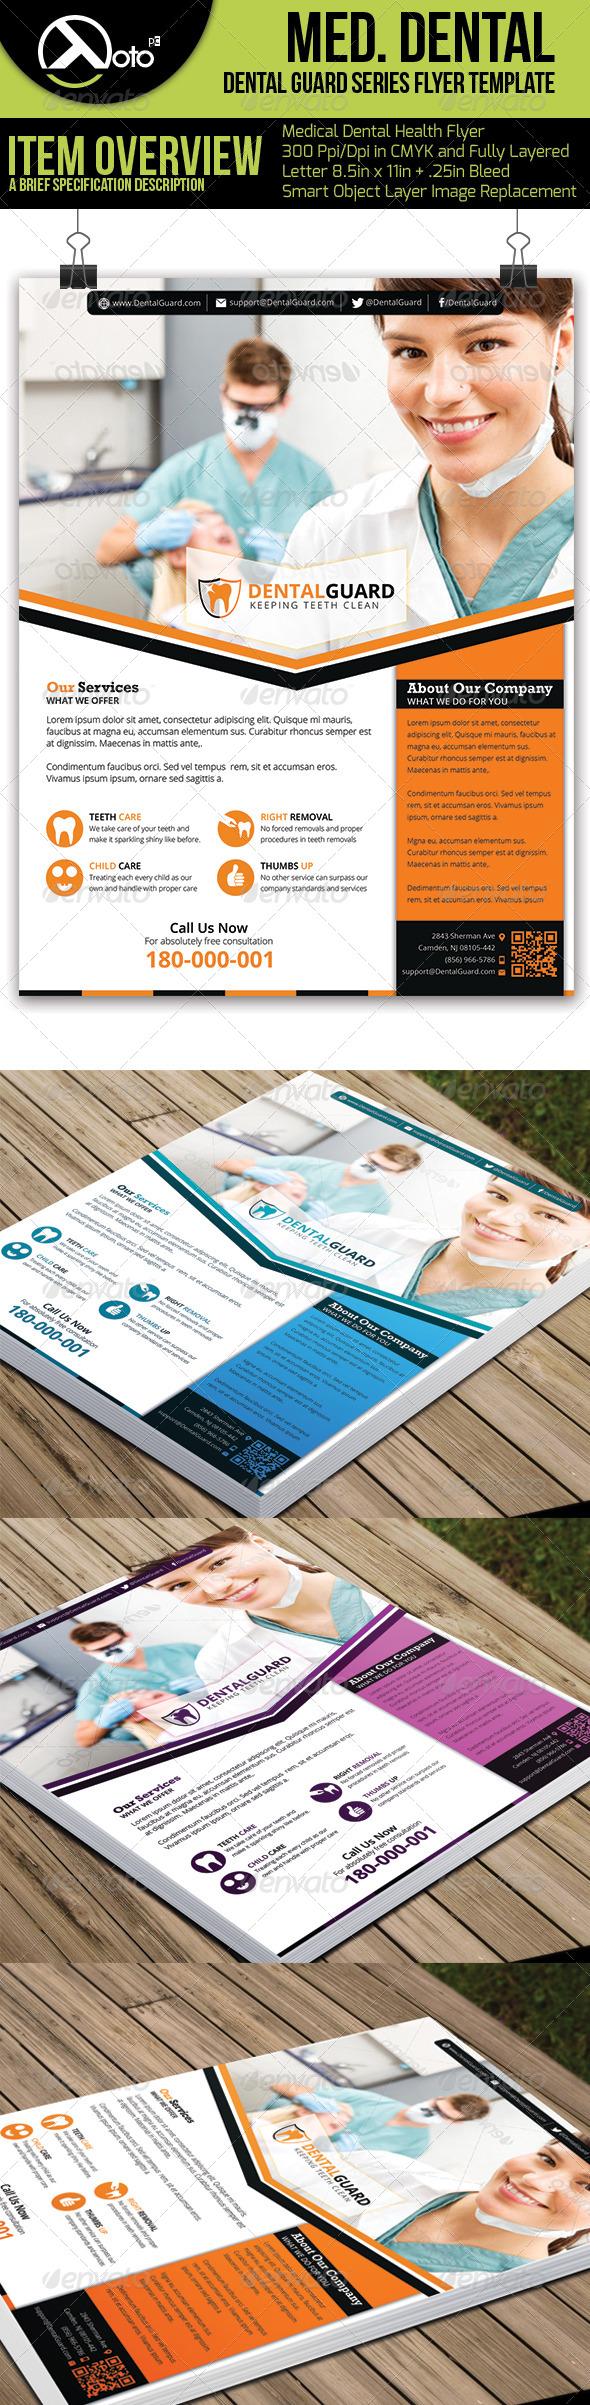 Medical Dental Flyer  V5 - Flyers Print Templates